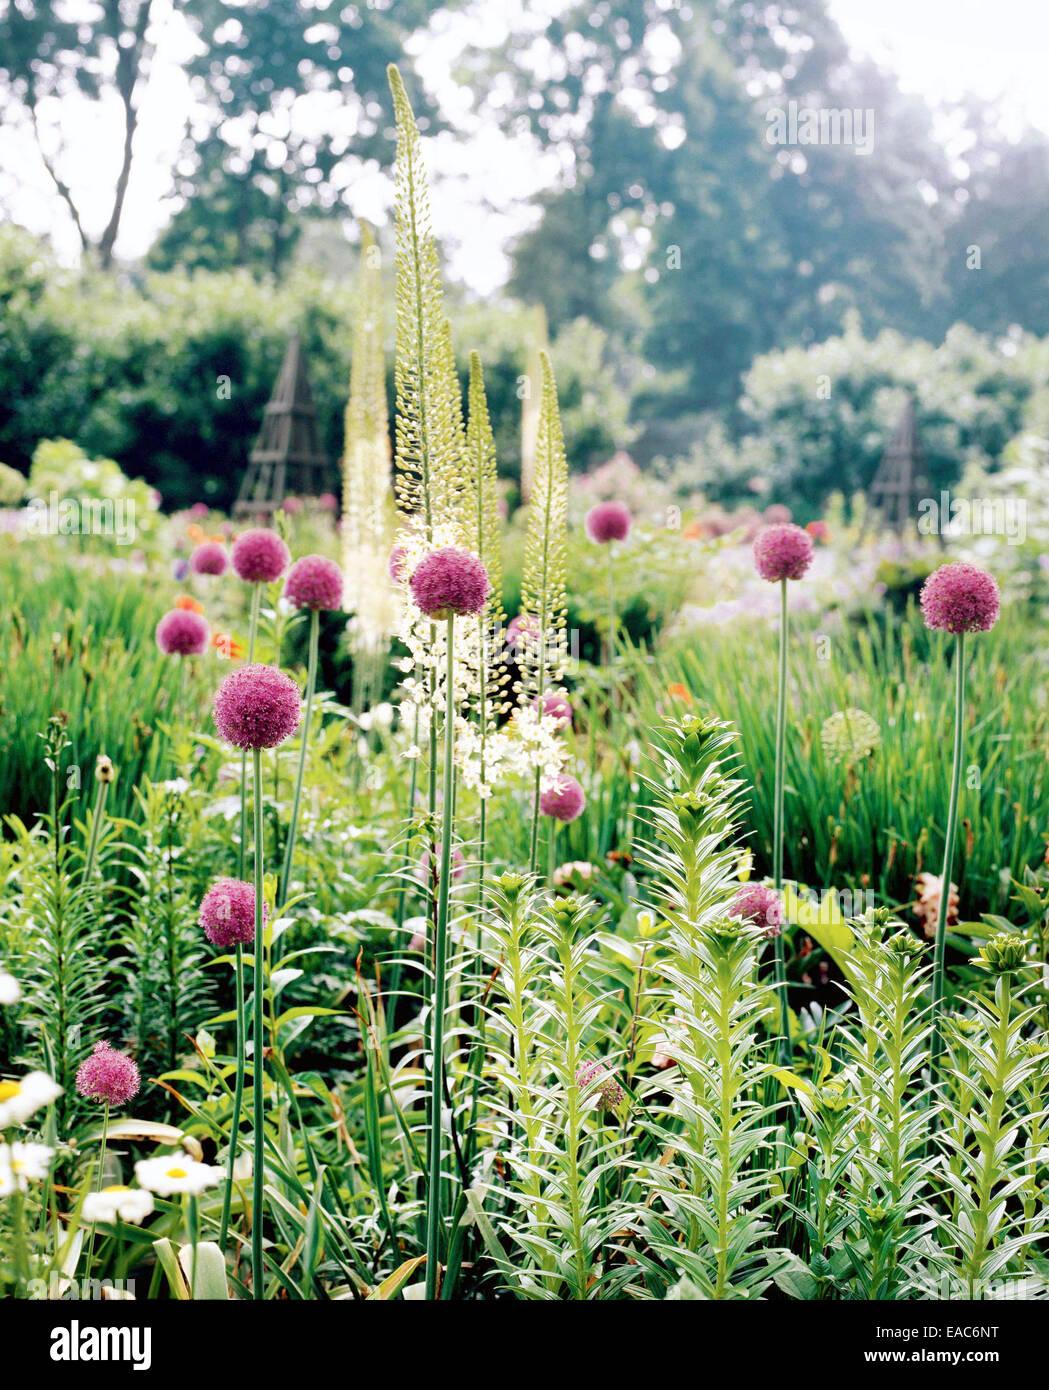 alliums in spring garden - Stock Image